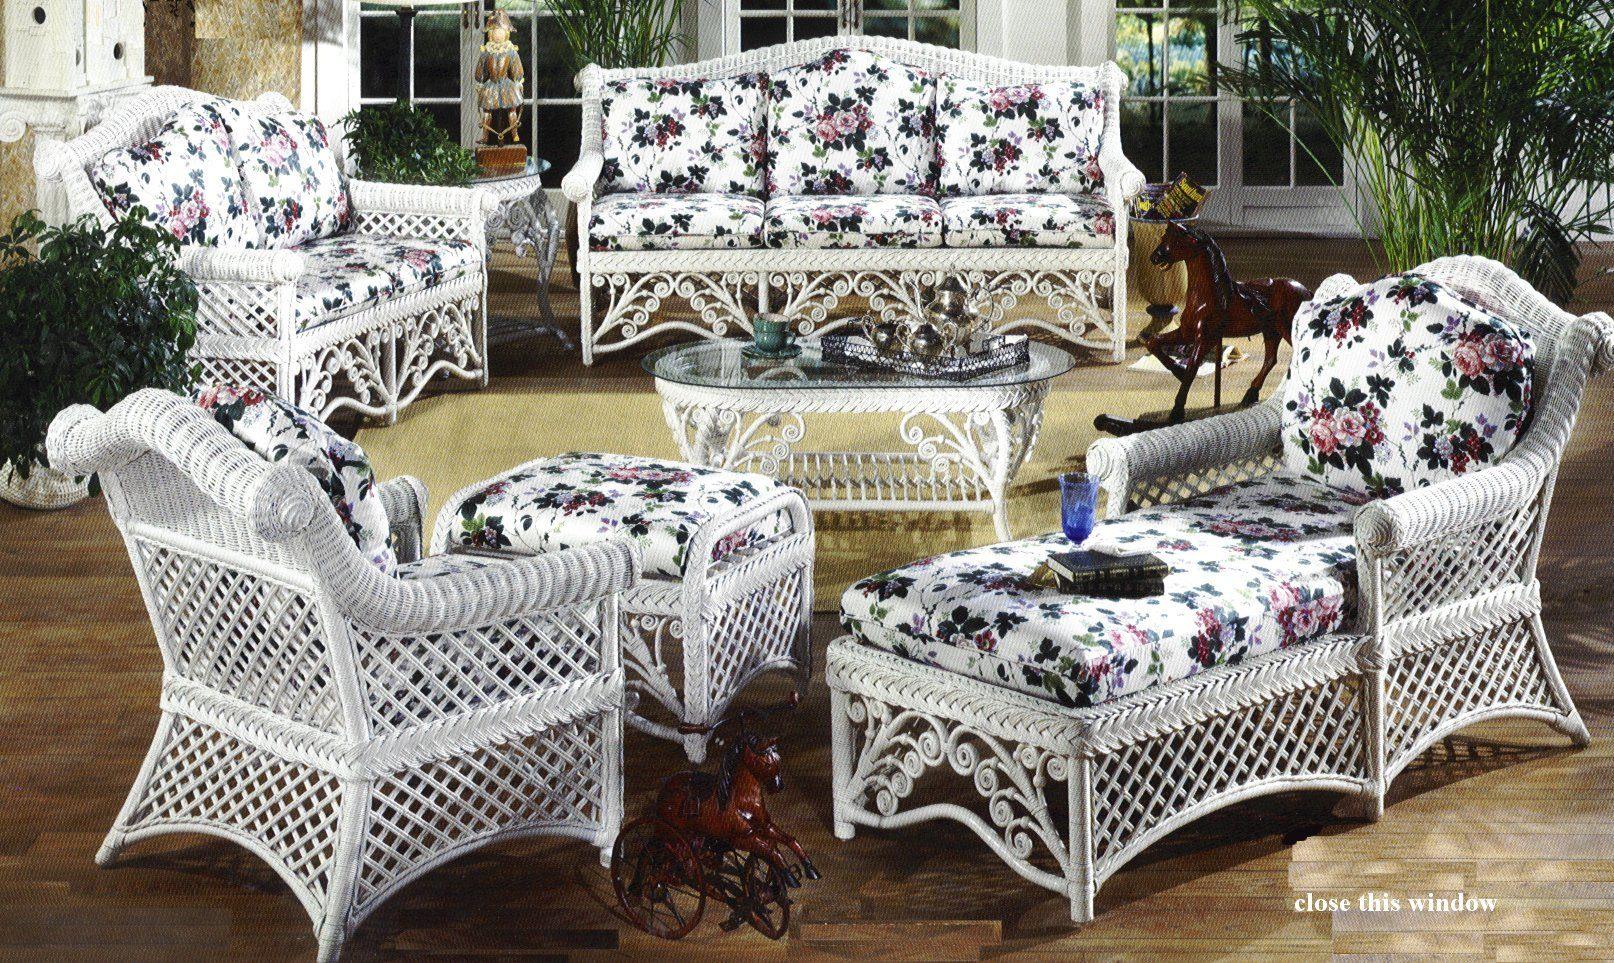 gazebo-victorian-wicker-furniture-vrqxupl-